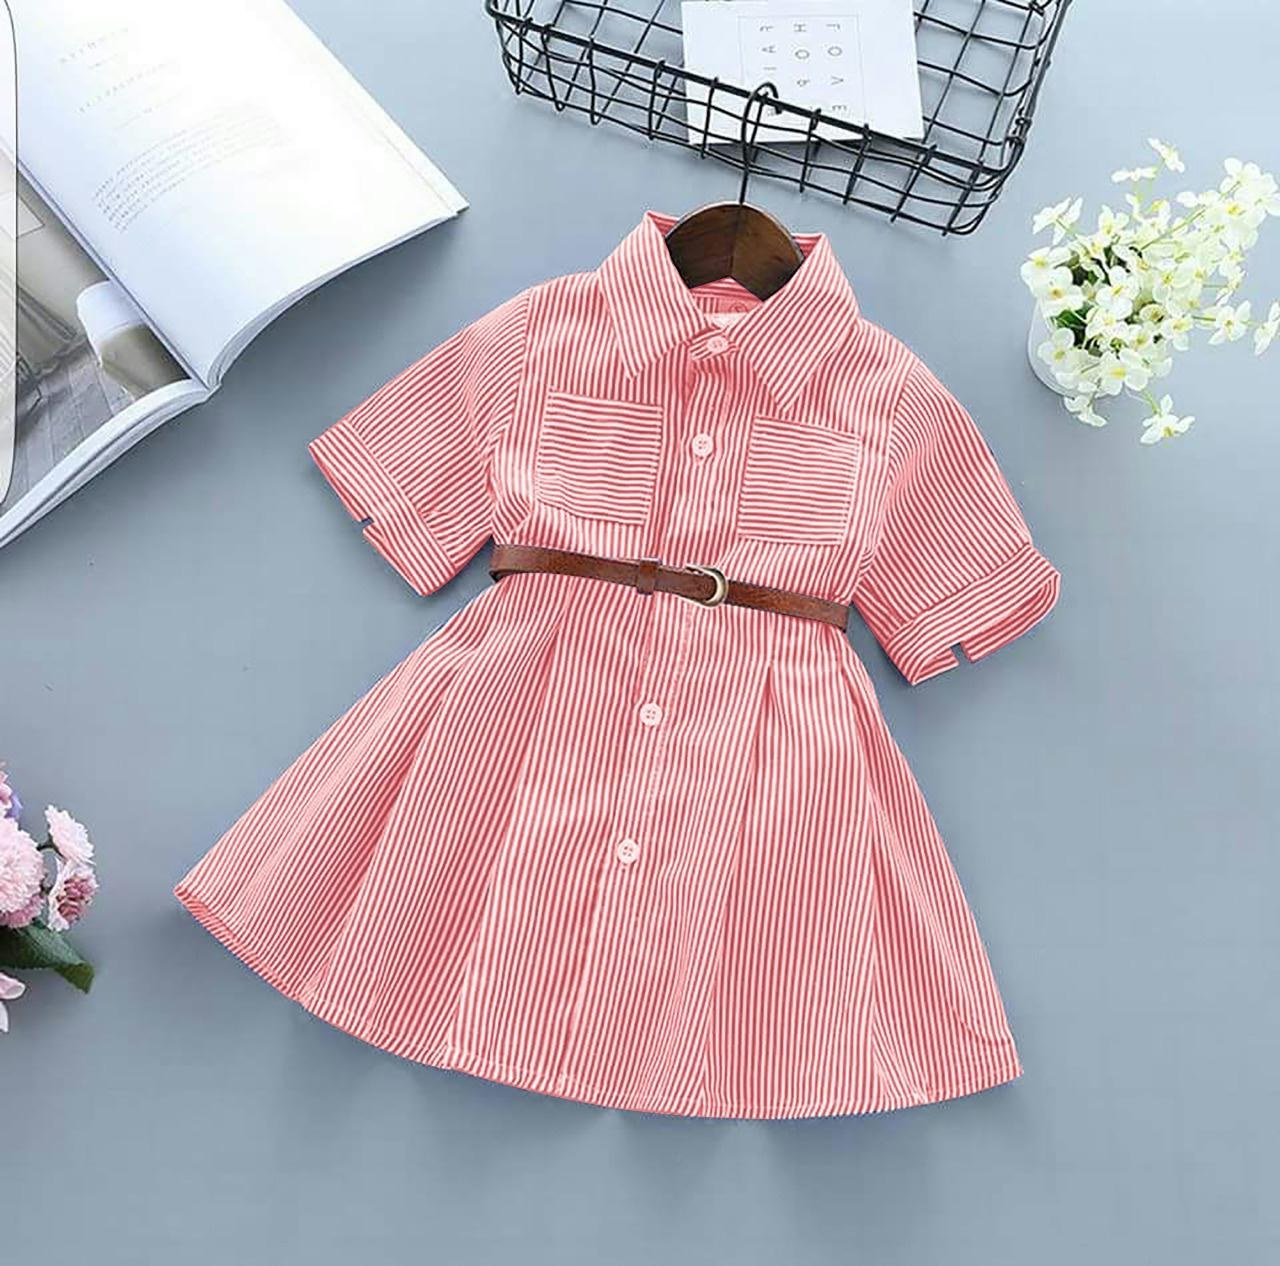 Model Baju Lebaran 2019 Anak Perempuan Dddy Contoh Baju Anak Perempuan Model Baju Terbaru 2019